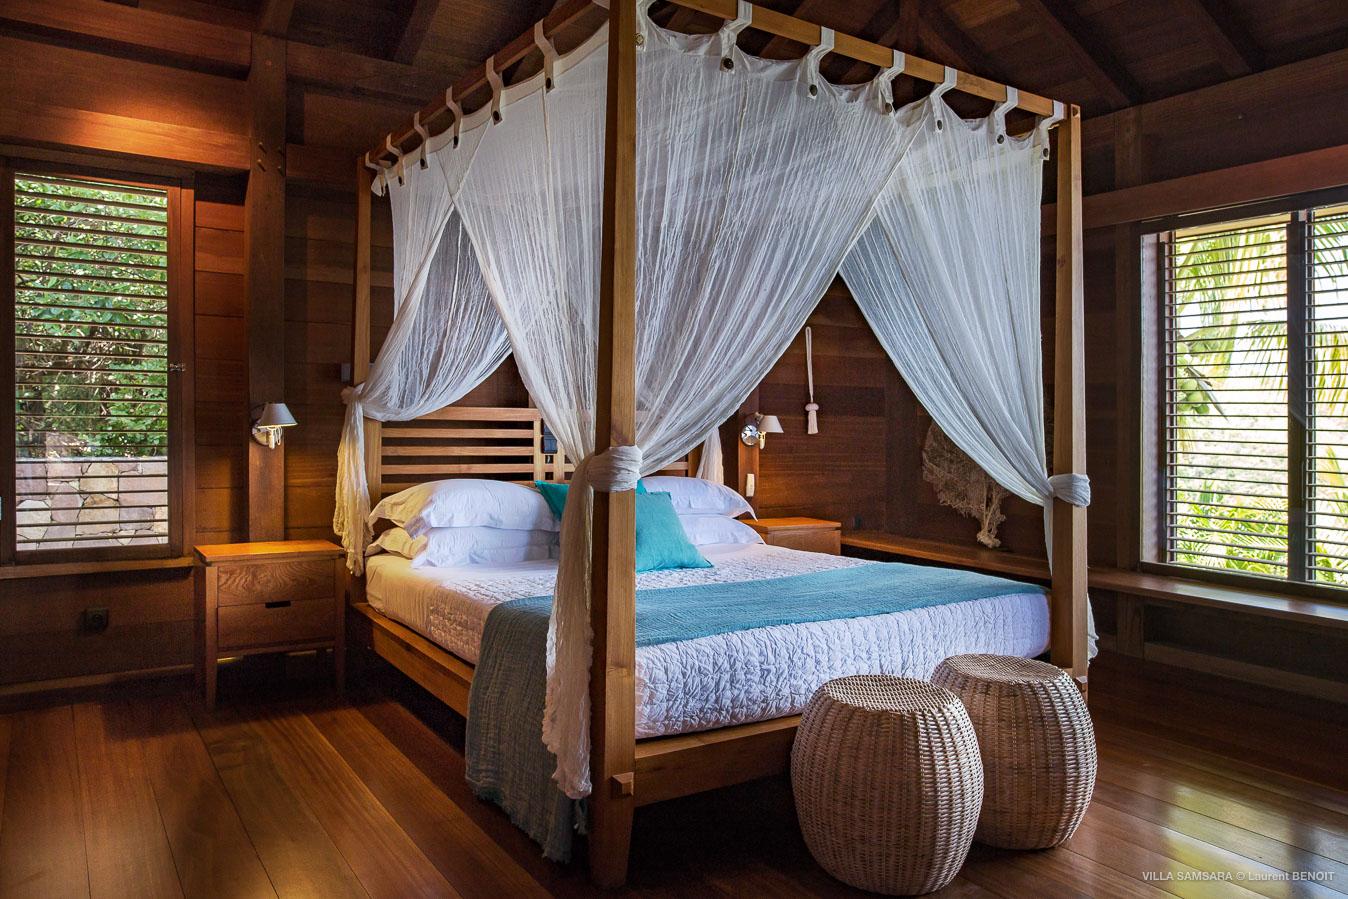 Villa Samsara - Sunset Villa For Rent St Barth Pointe Milou in Balinese Wood - Bedroom